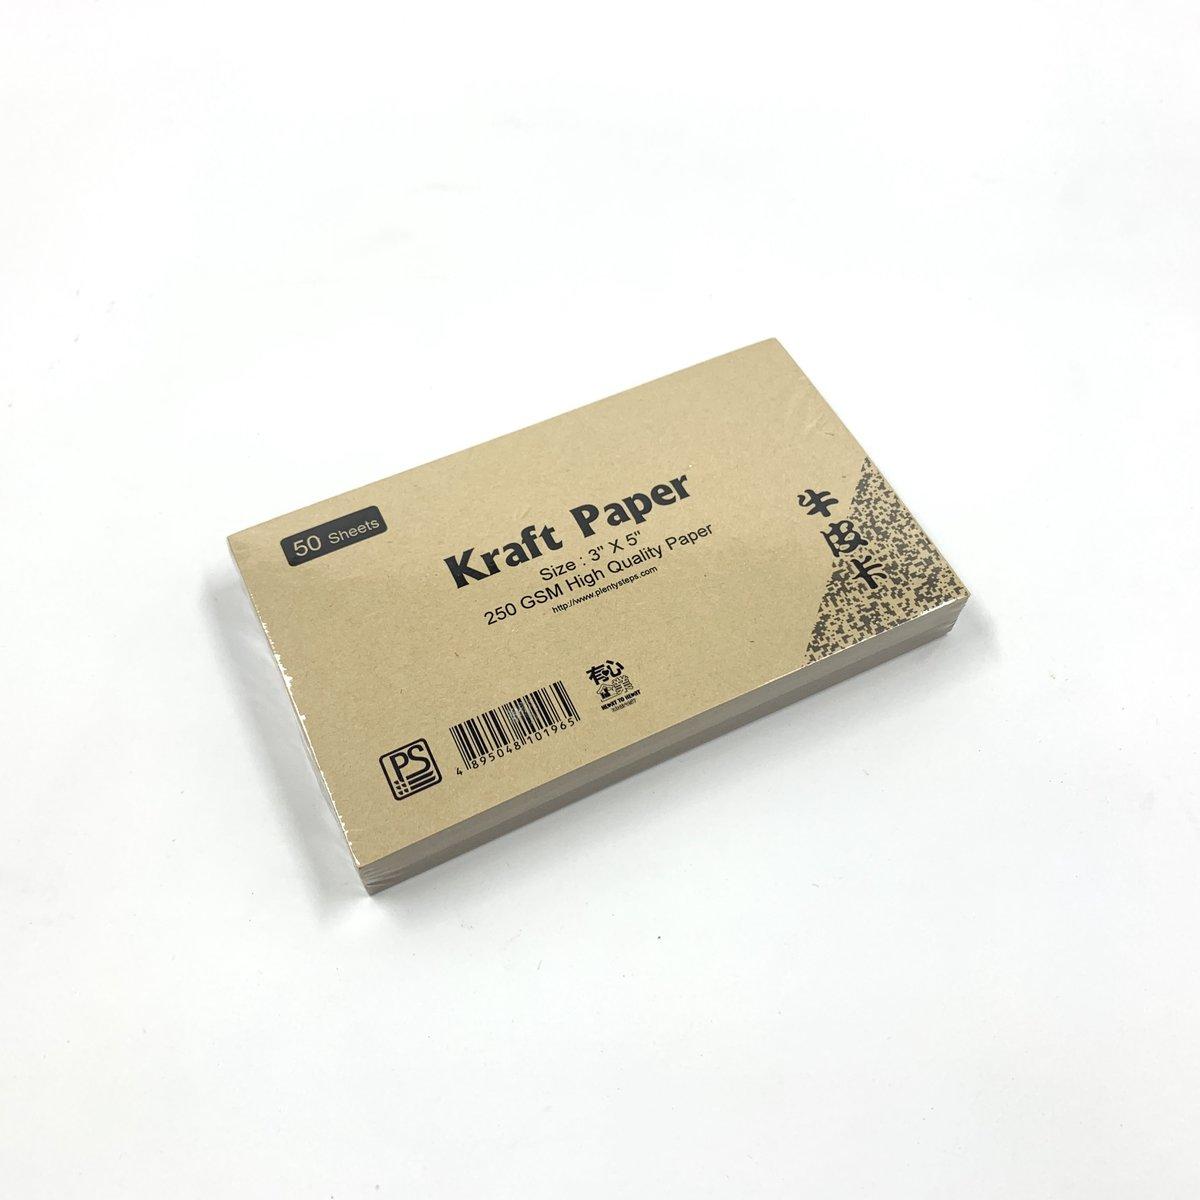 "3"" x 5"" Kraft Card (250gsm) - 6 packs"